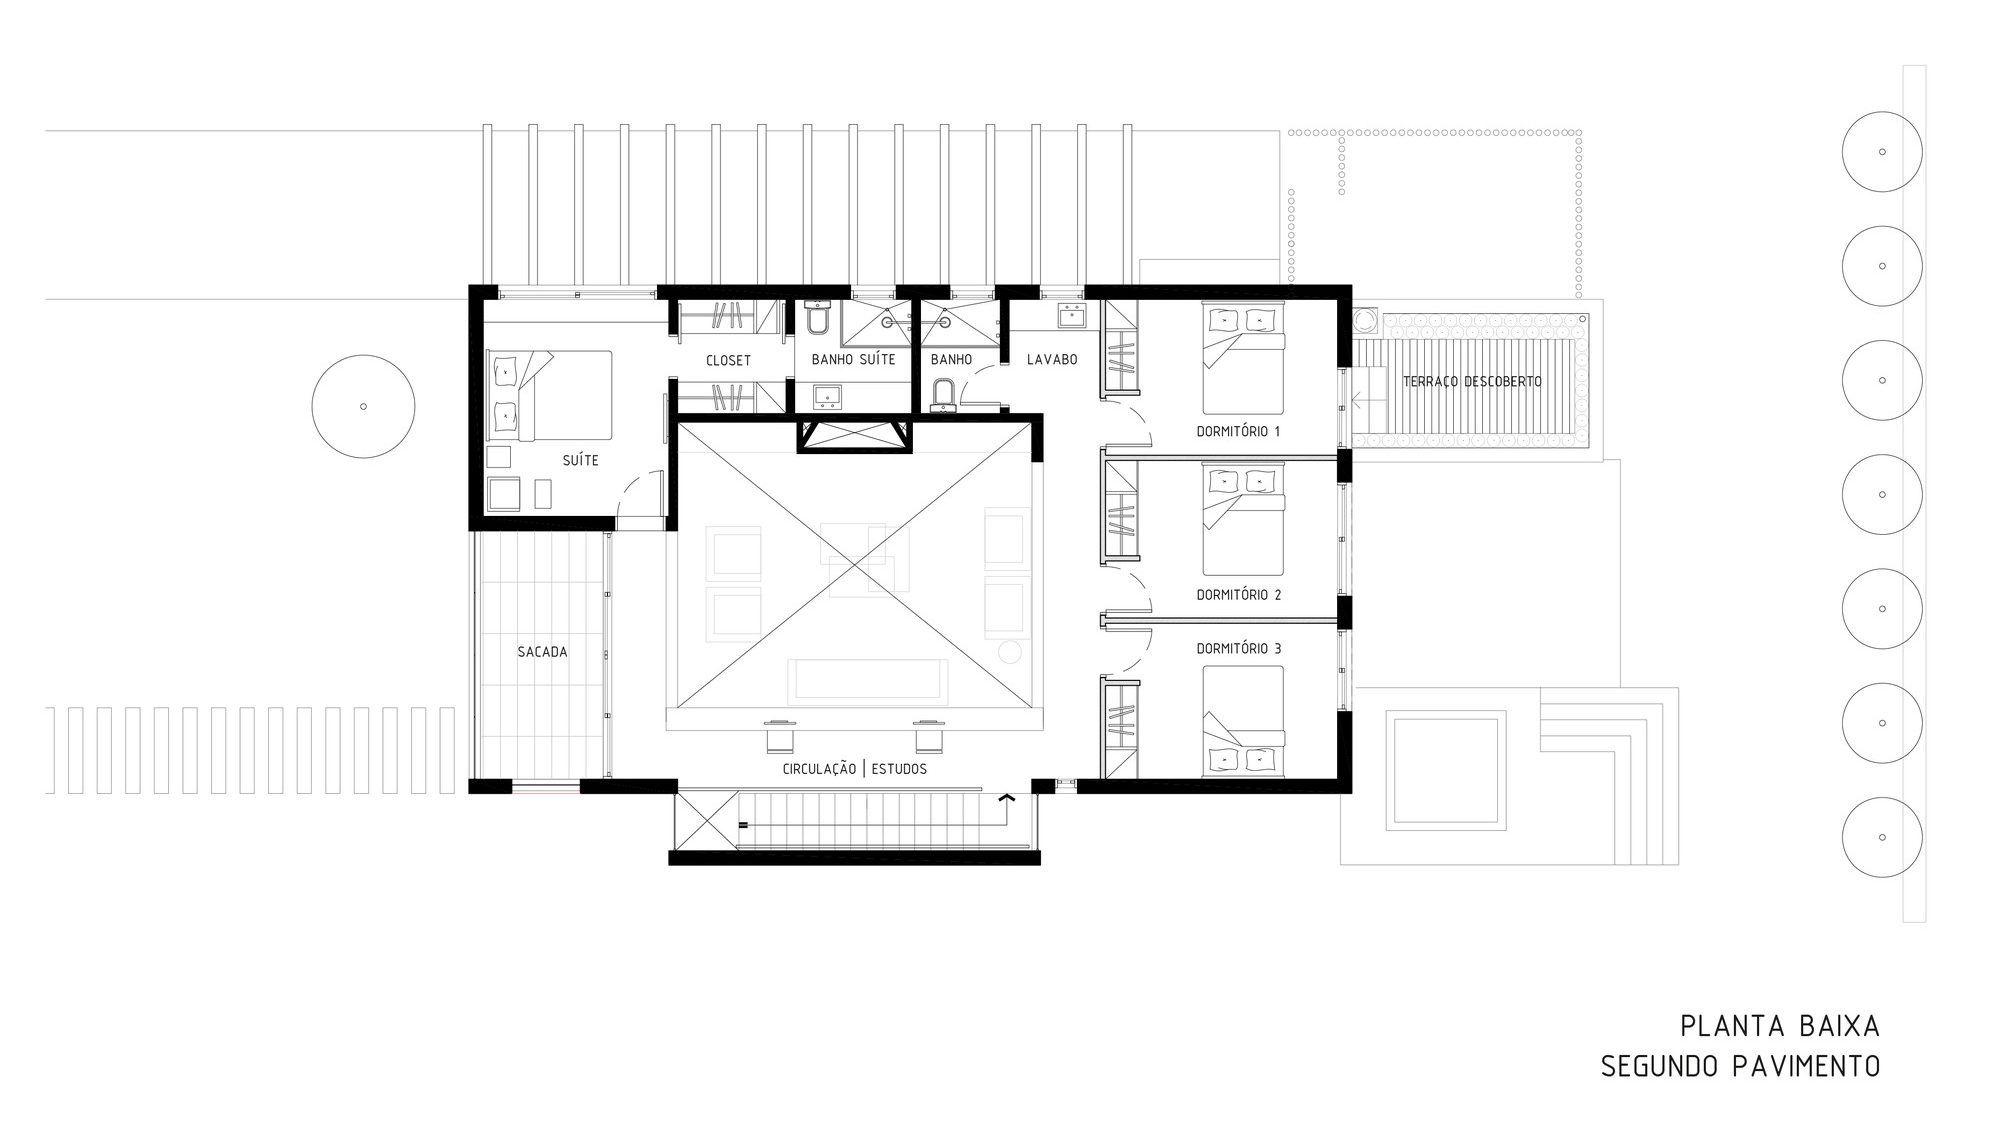 Vga To Cat5e Wiring Diagram